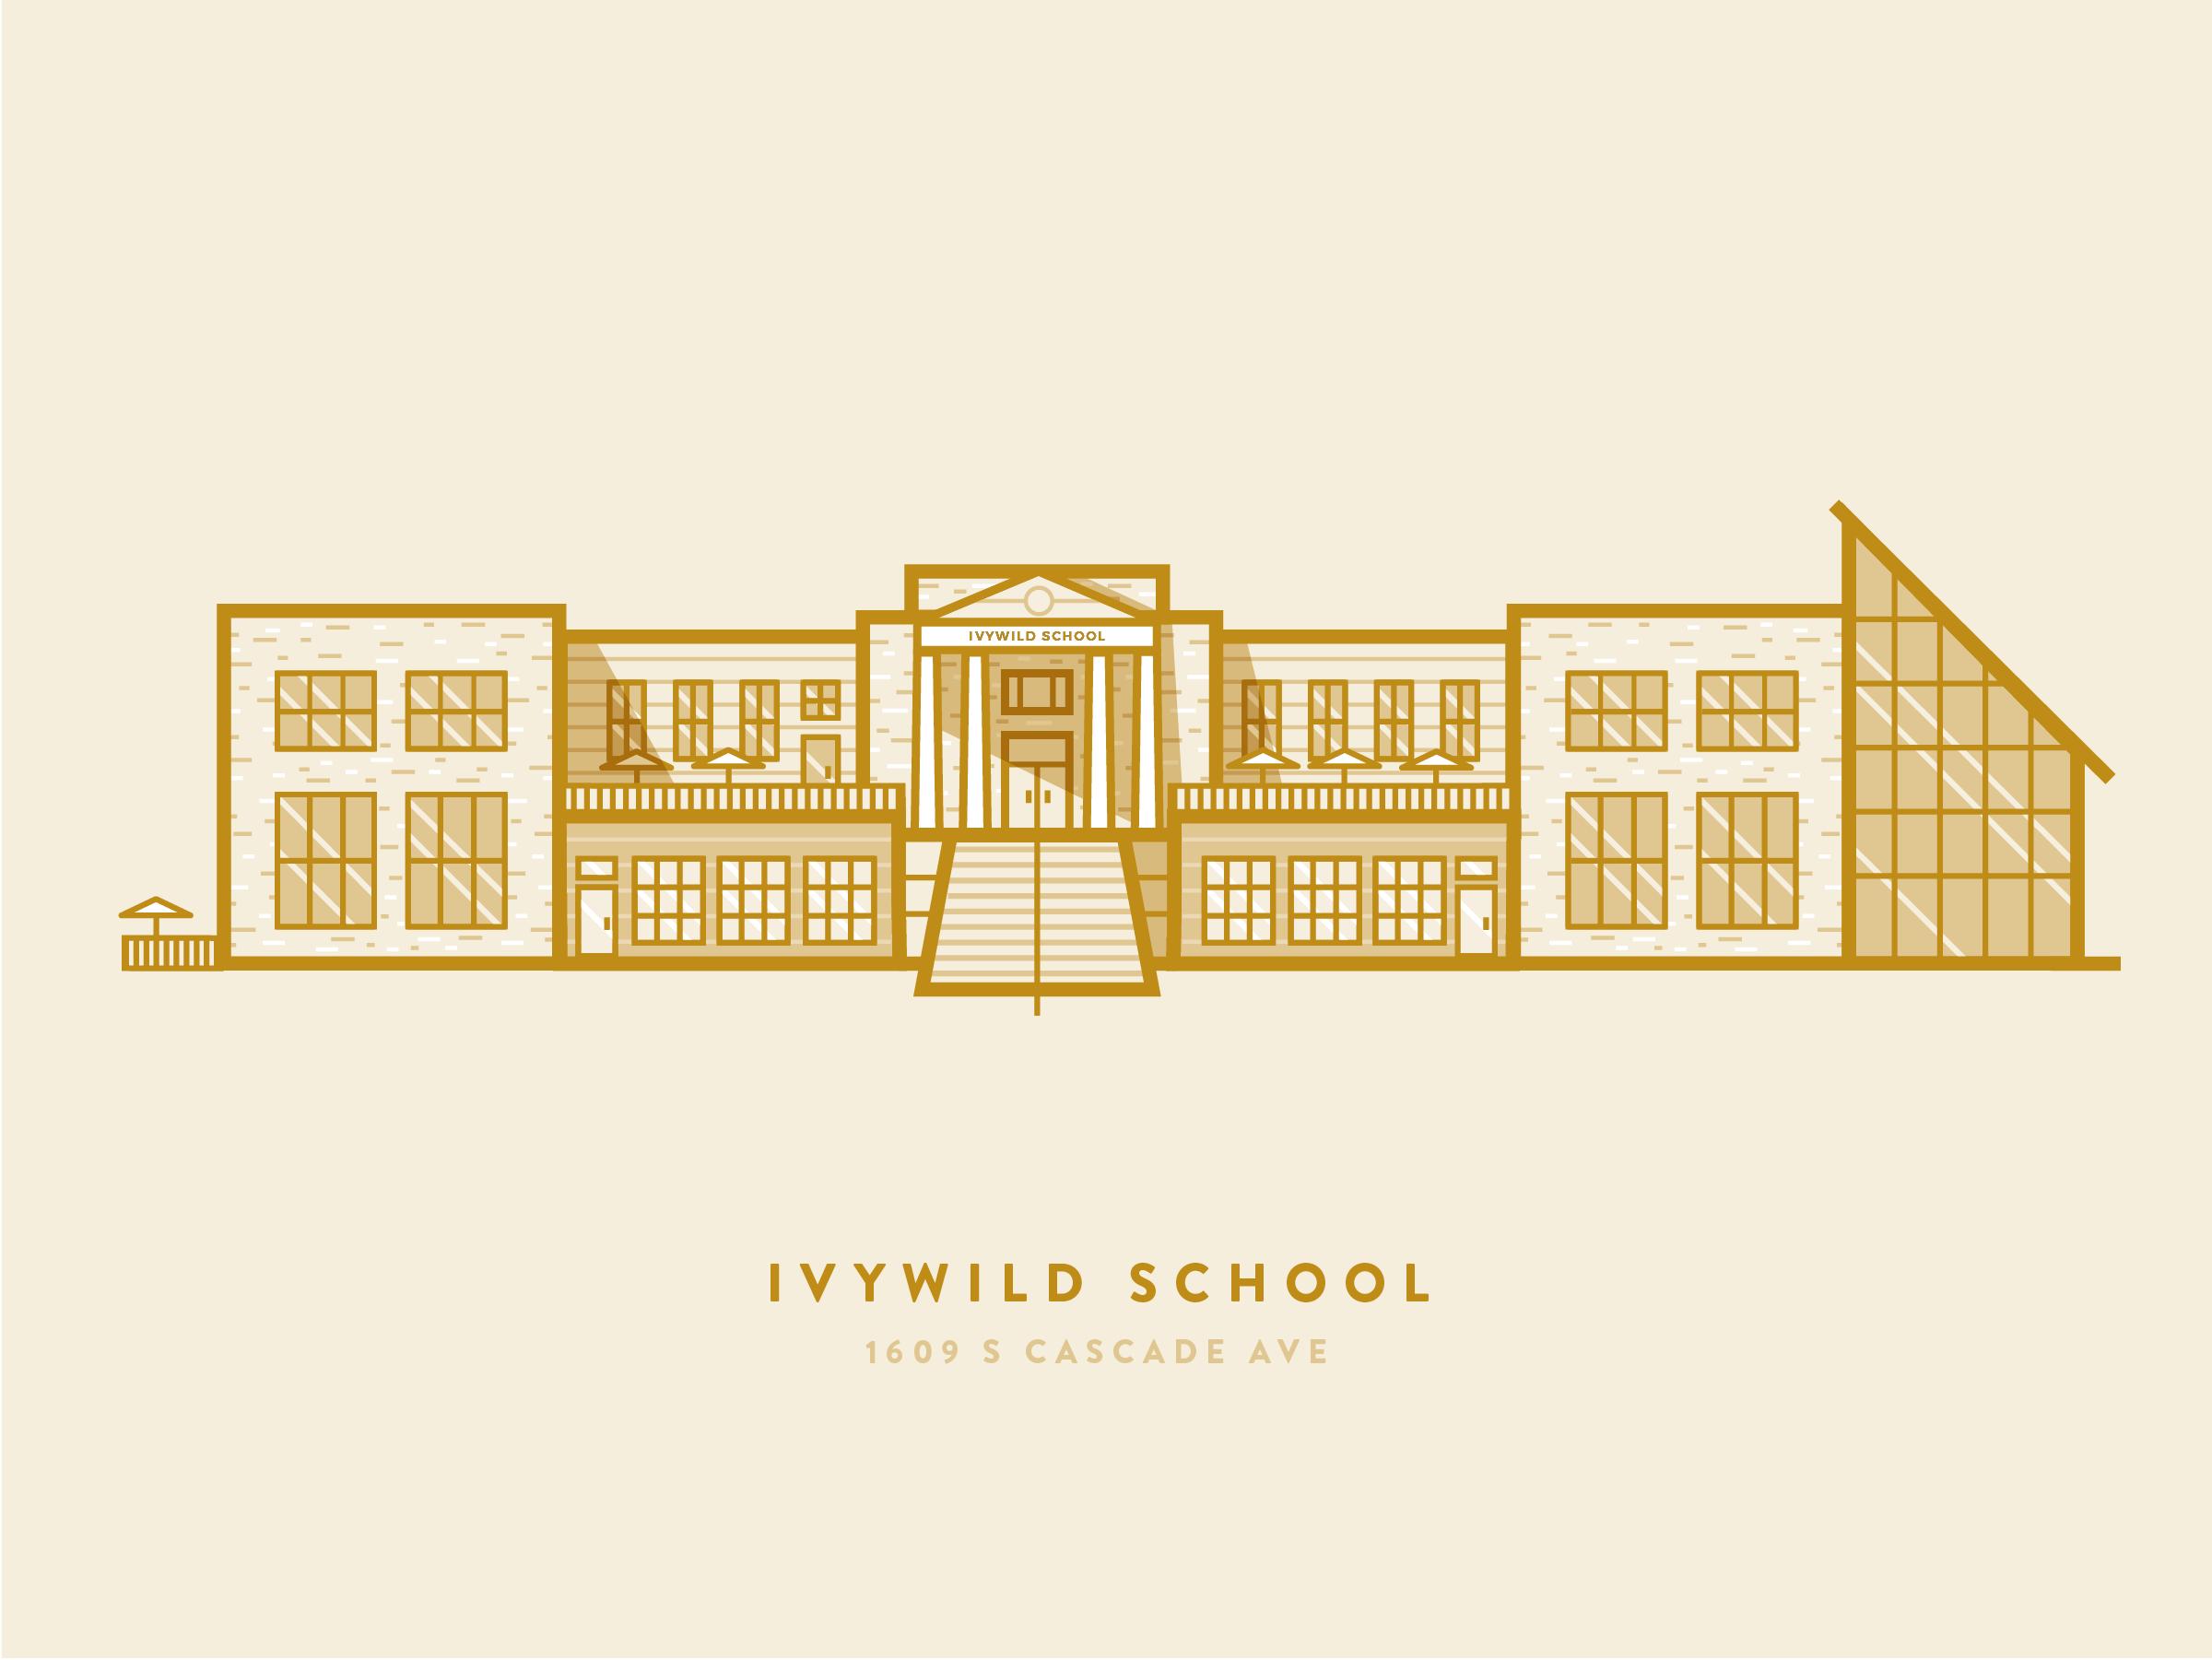 Ivywild school 3x